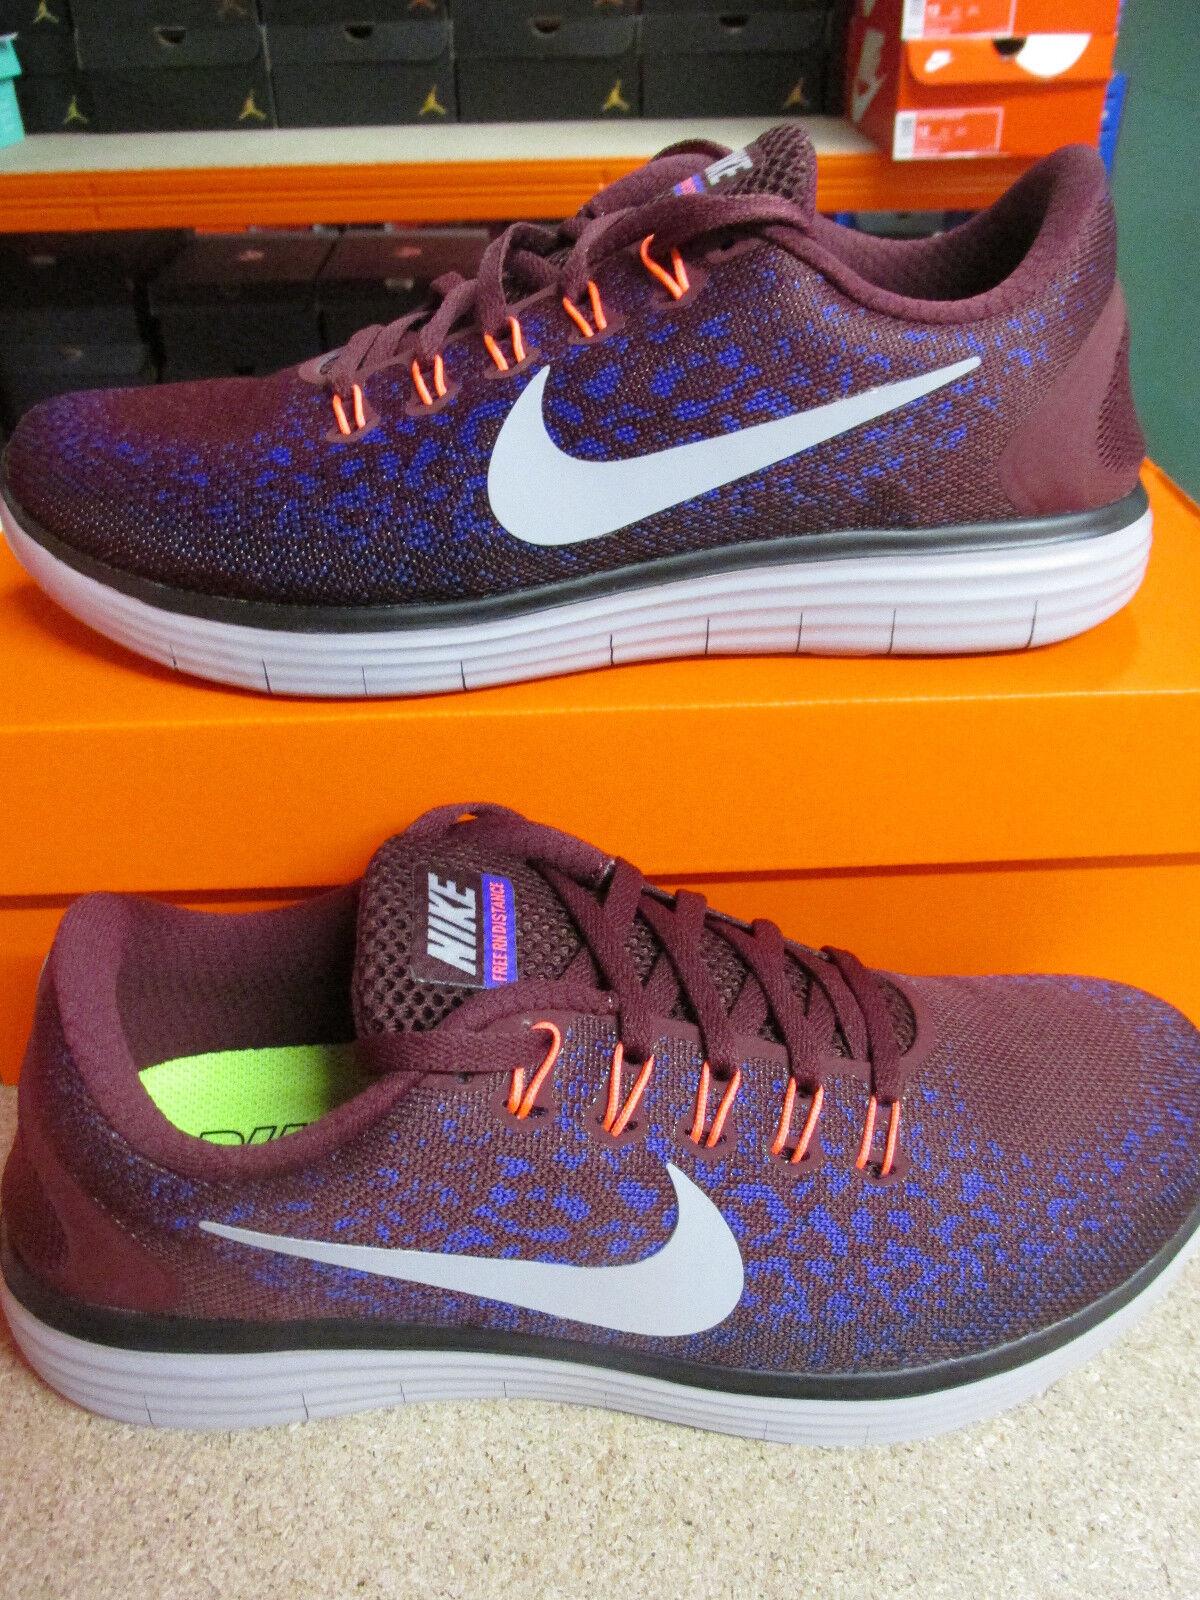 Nike Free Rn Distance scarpe uomo da corsa 827115 600 Scarpe da tennis